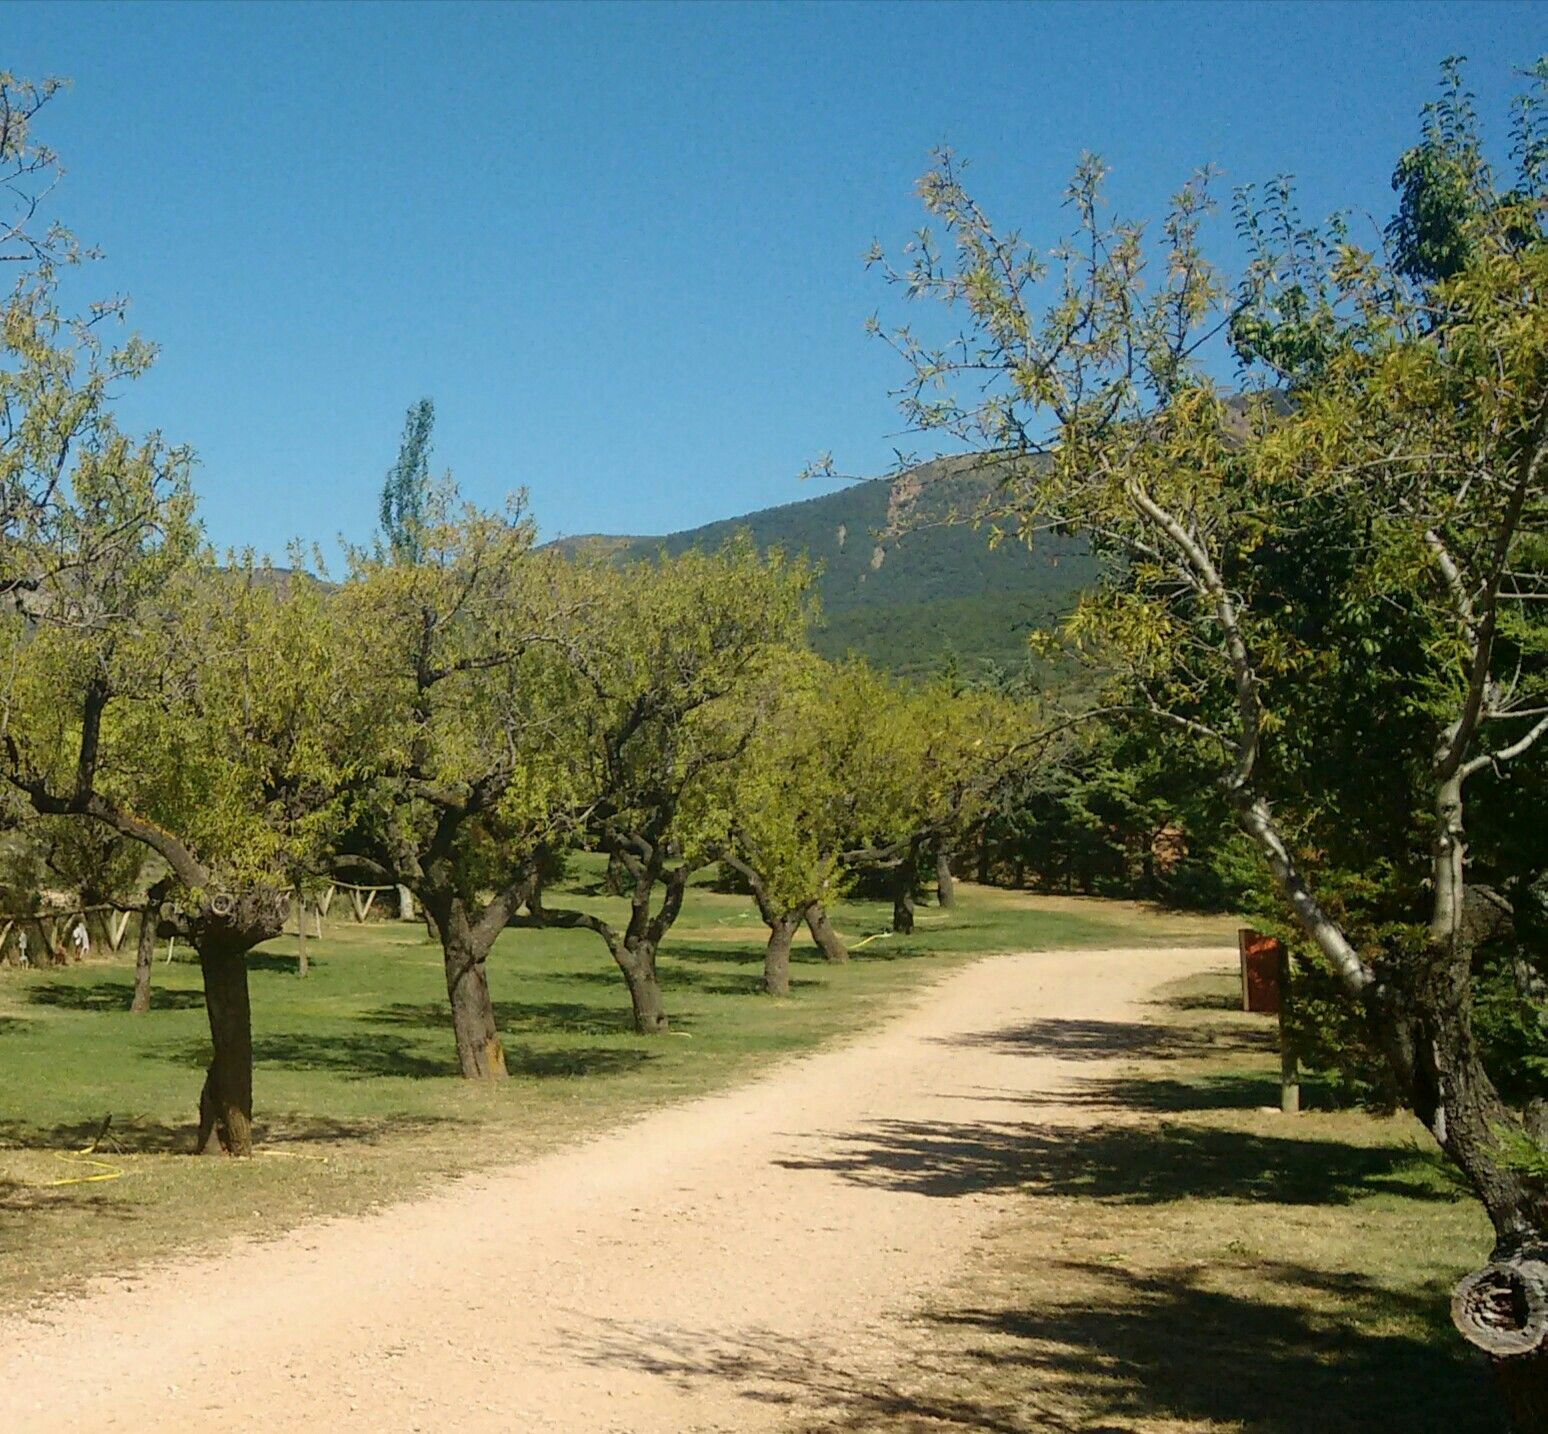 Camping Castillo Loarre Spanje Ook In Het Hoofdseizoen Een Rustige En Aangename Plek Spanje Baskenland Camping